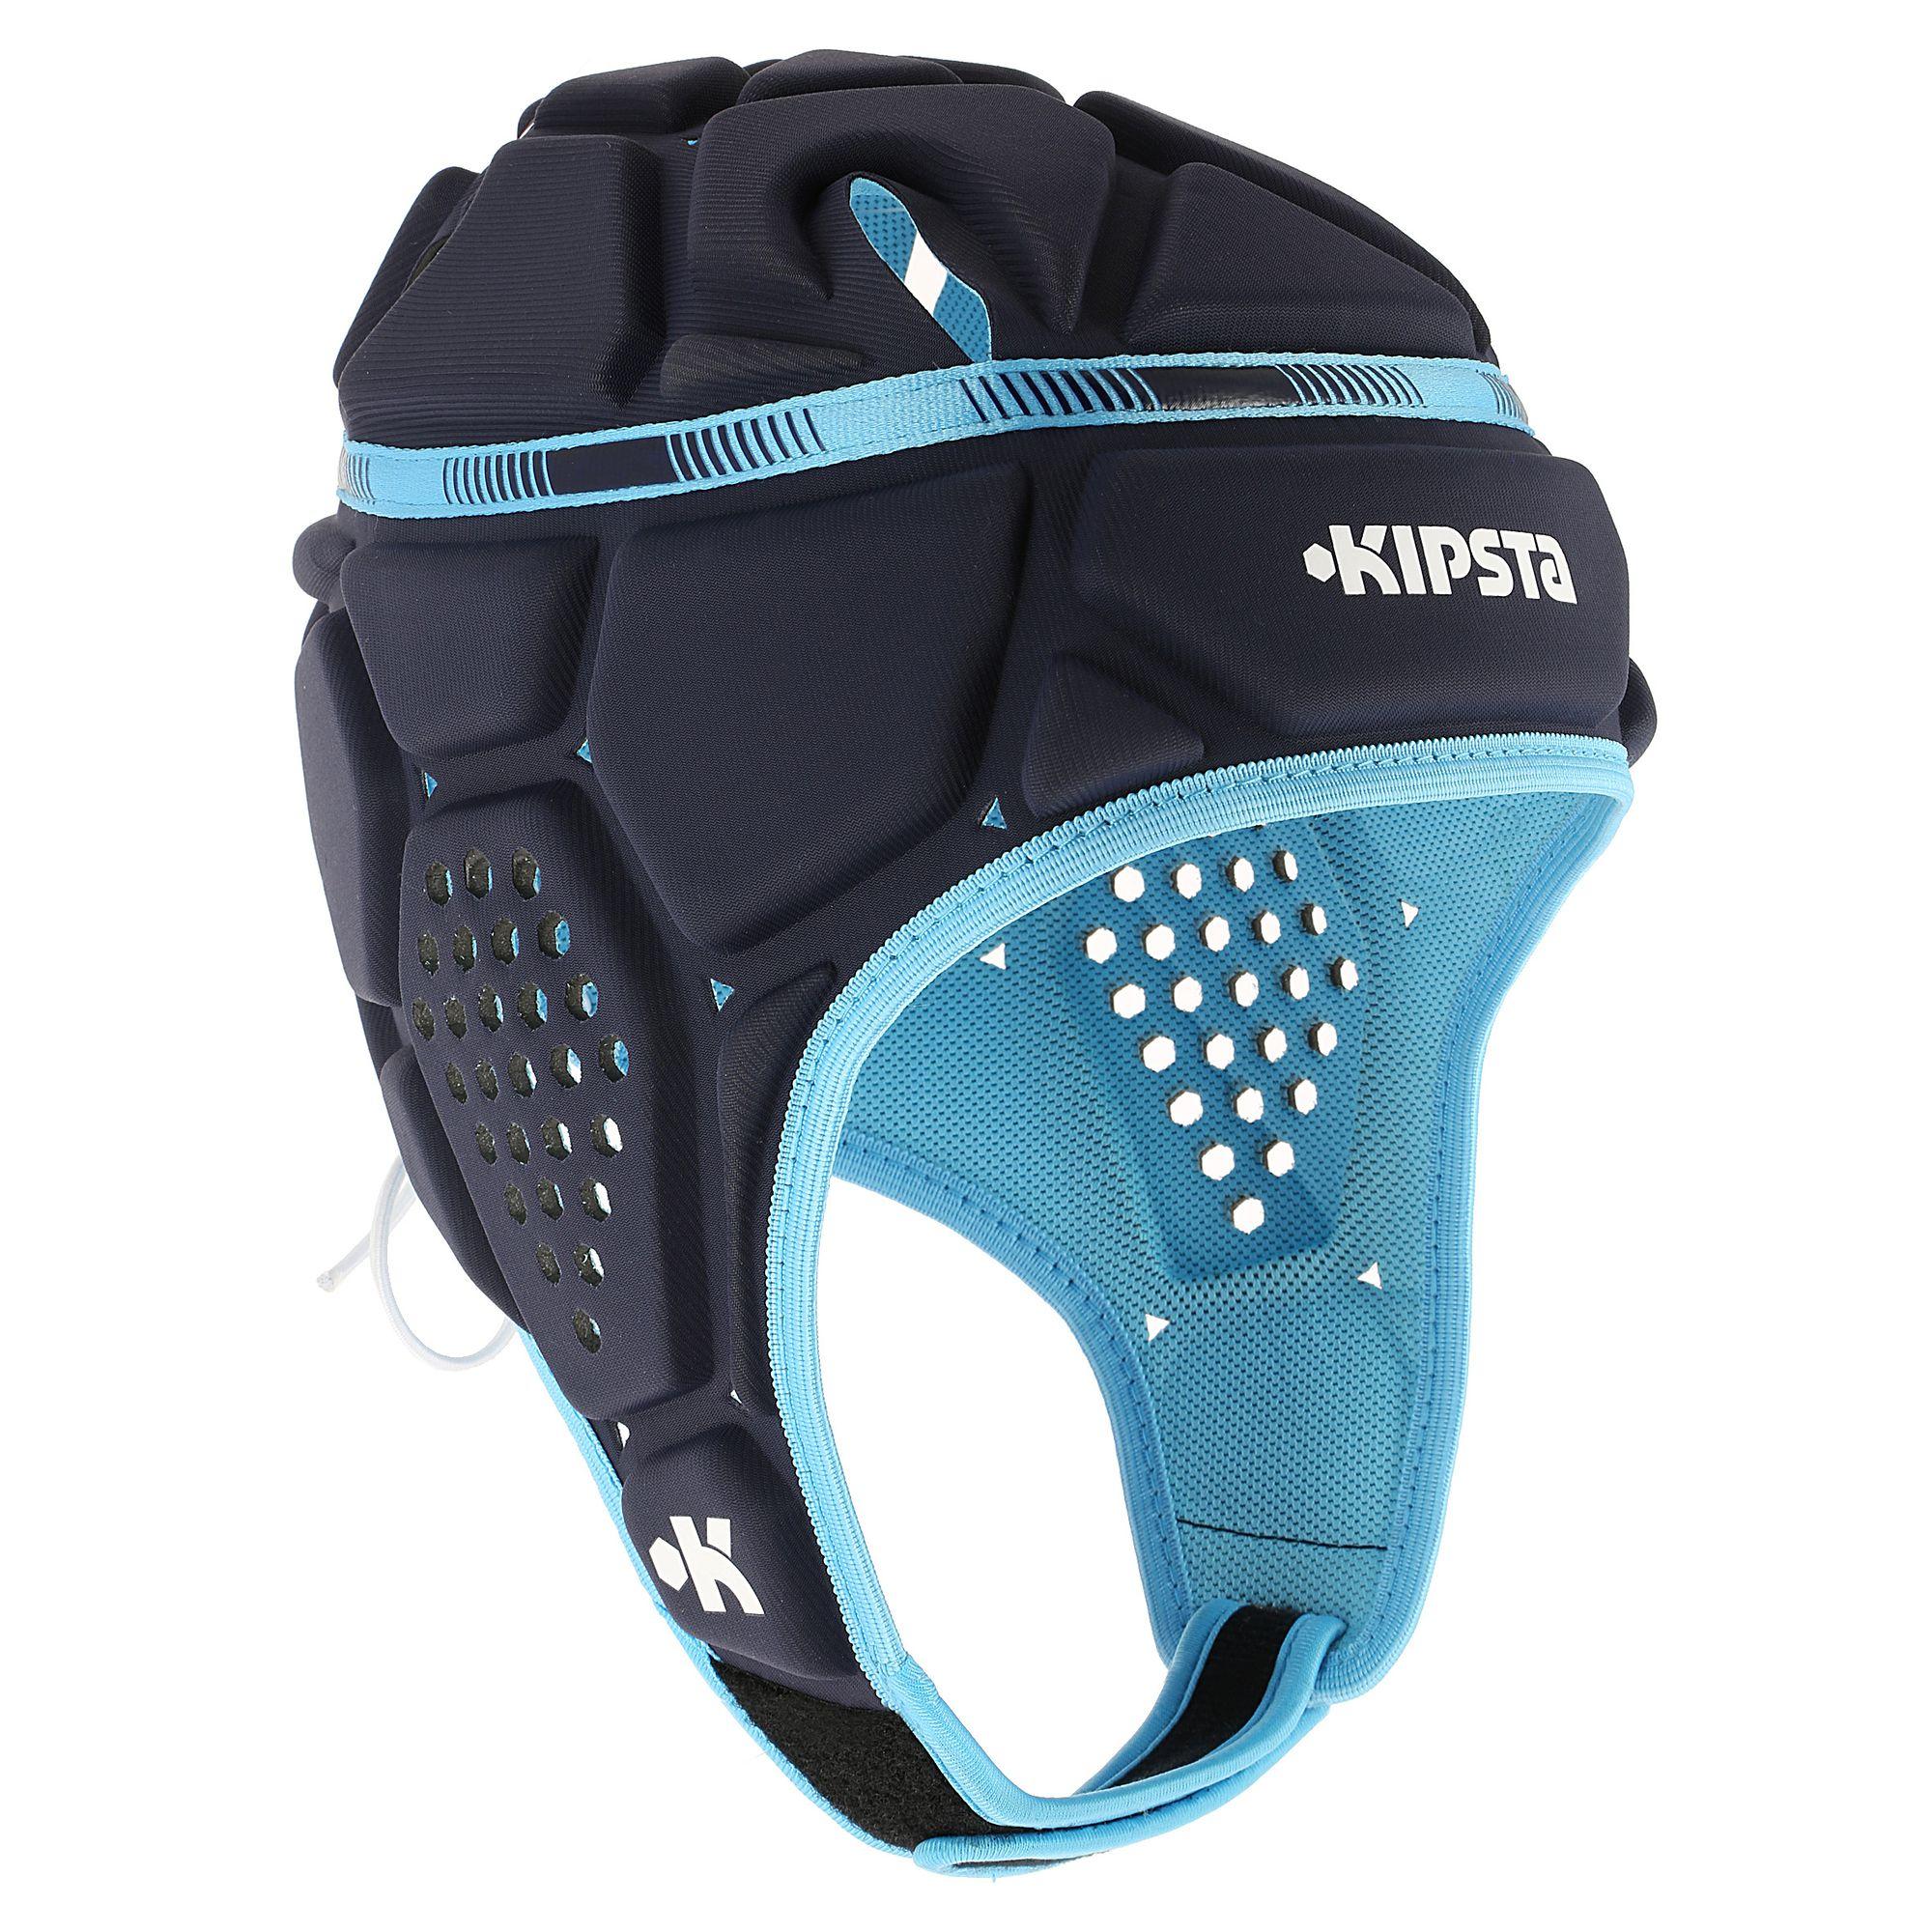 Casque rugby Full H 500 bleu